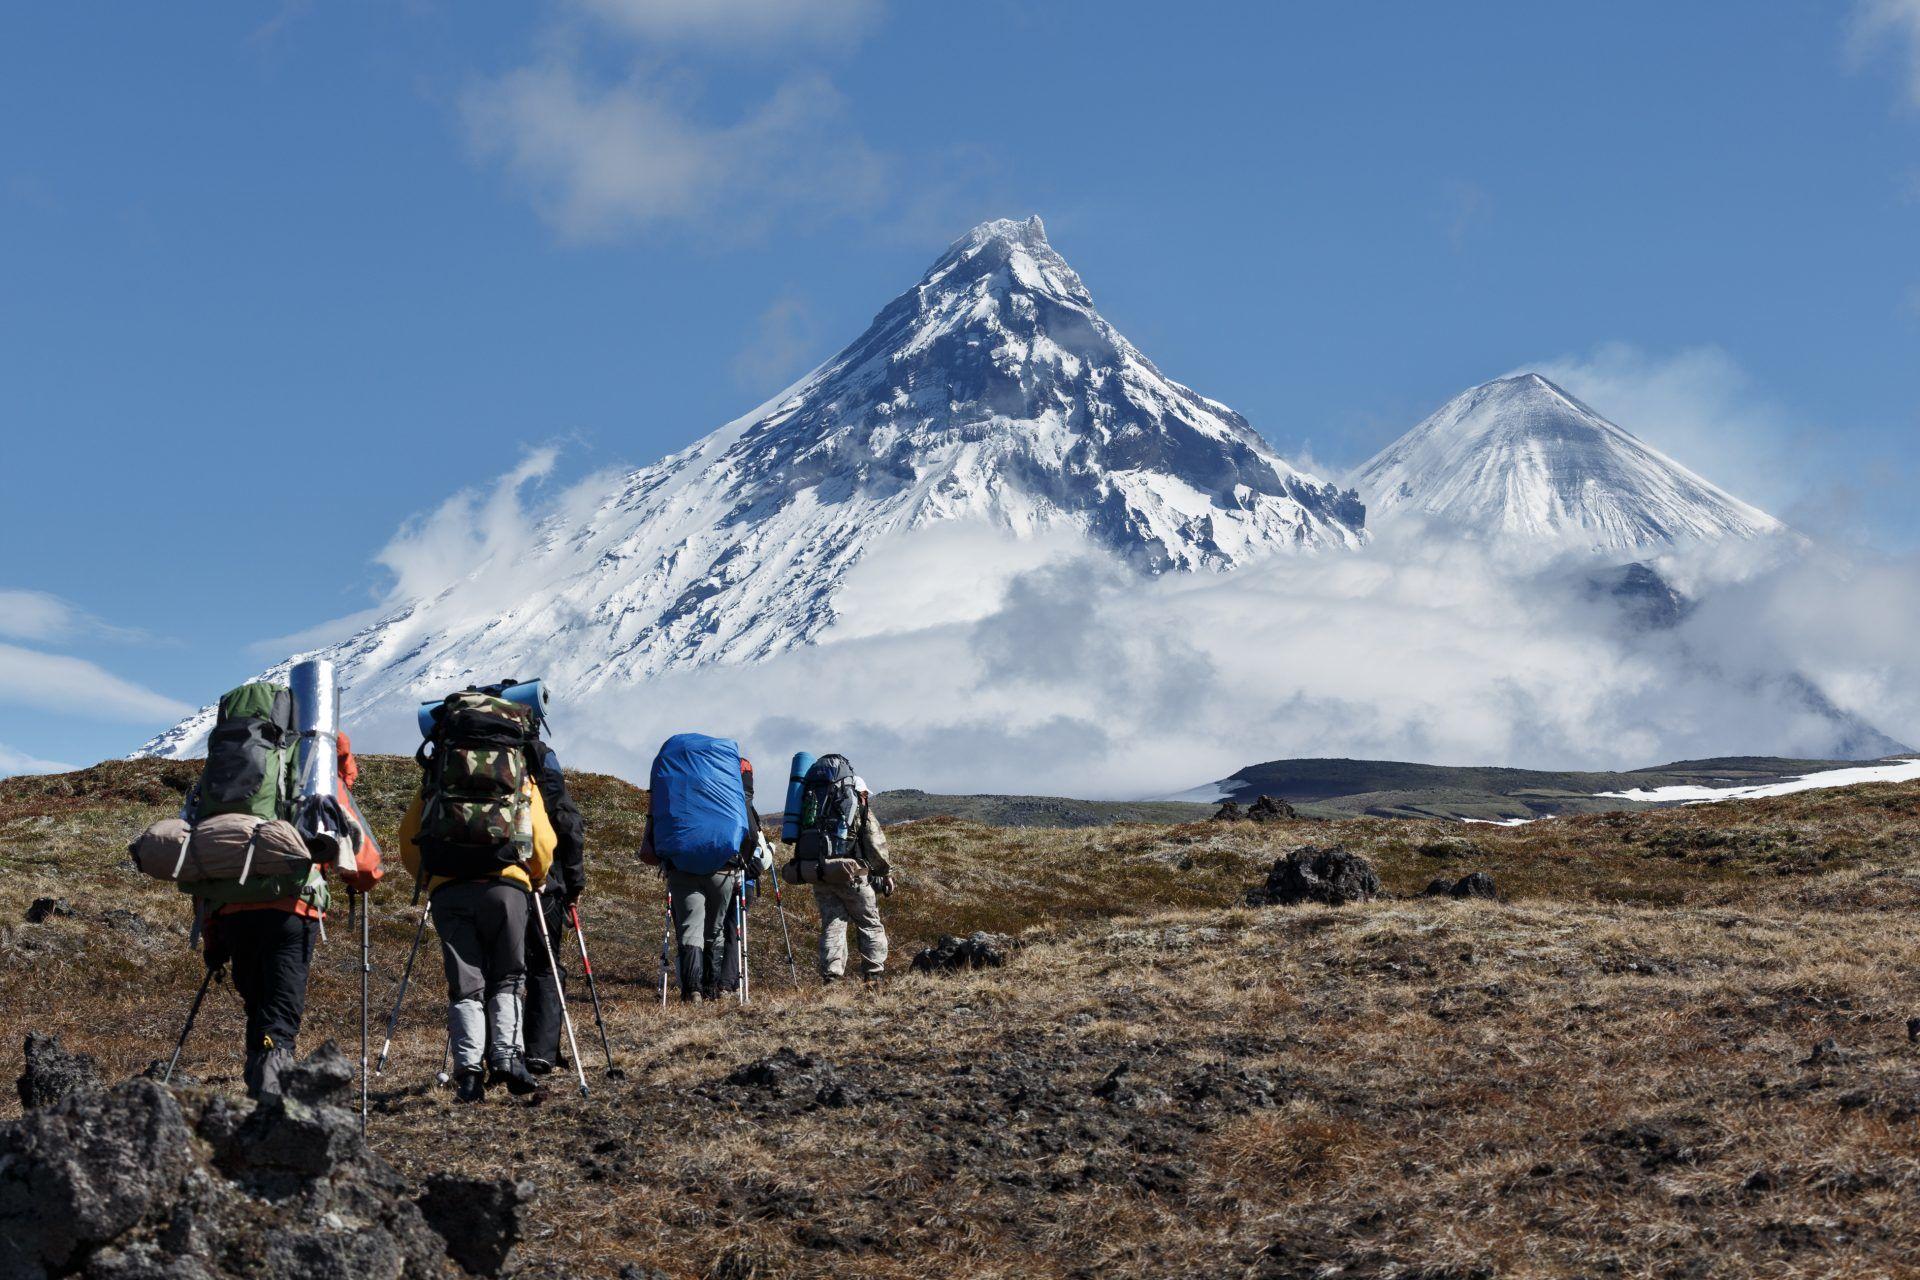 Aktivreise Kamtschatka, Trekking-Reise Kamtschatka, Halbinsel Kamtschatka